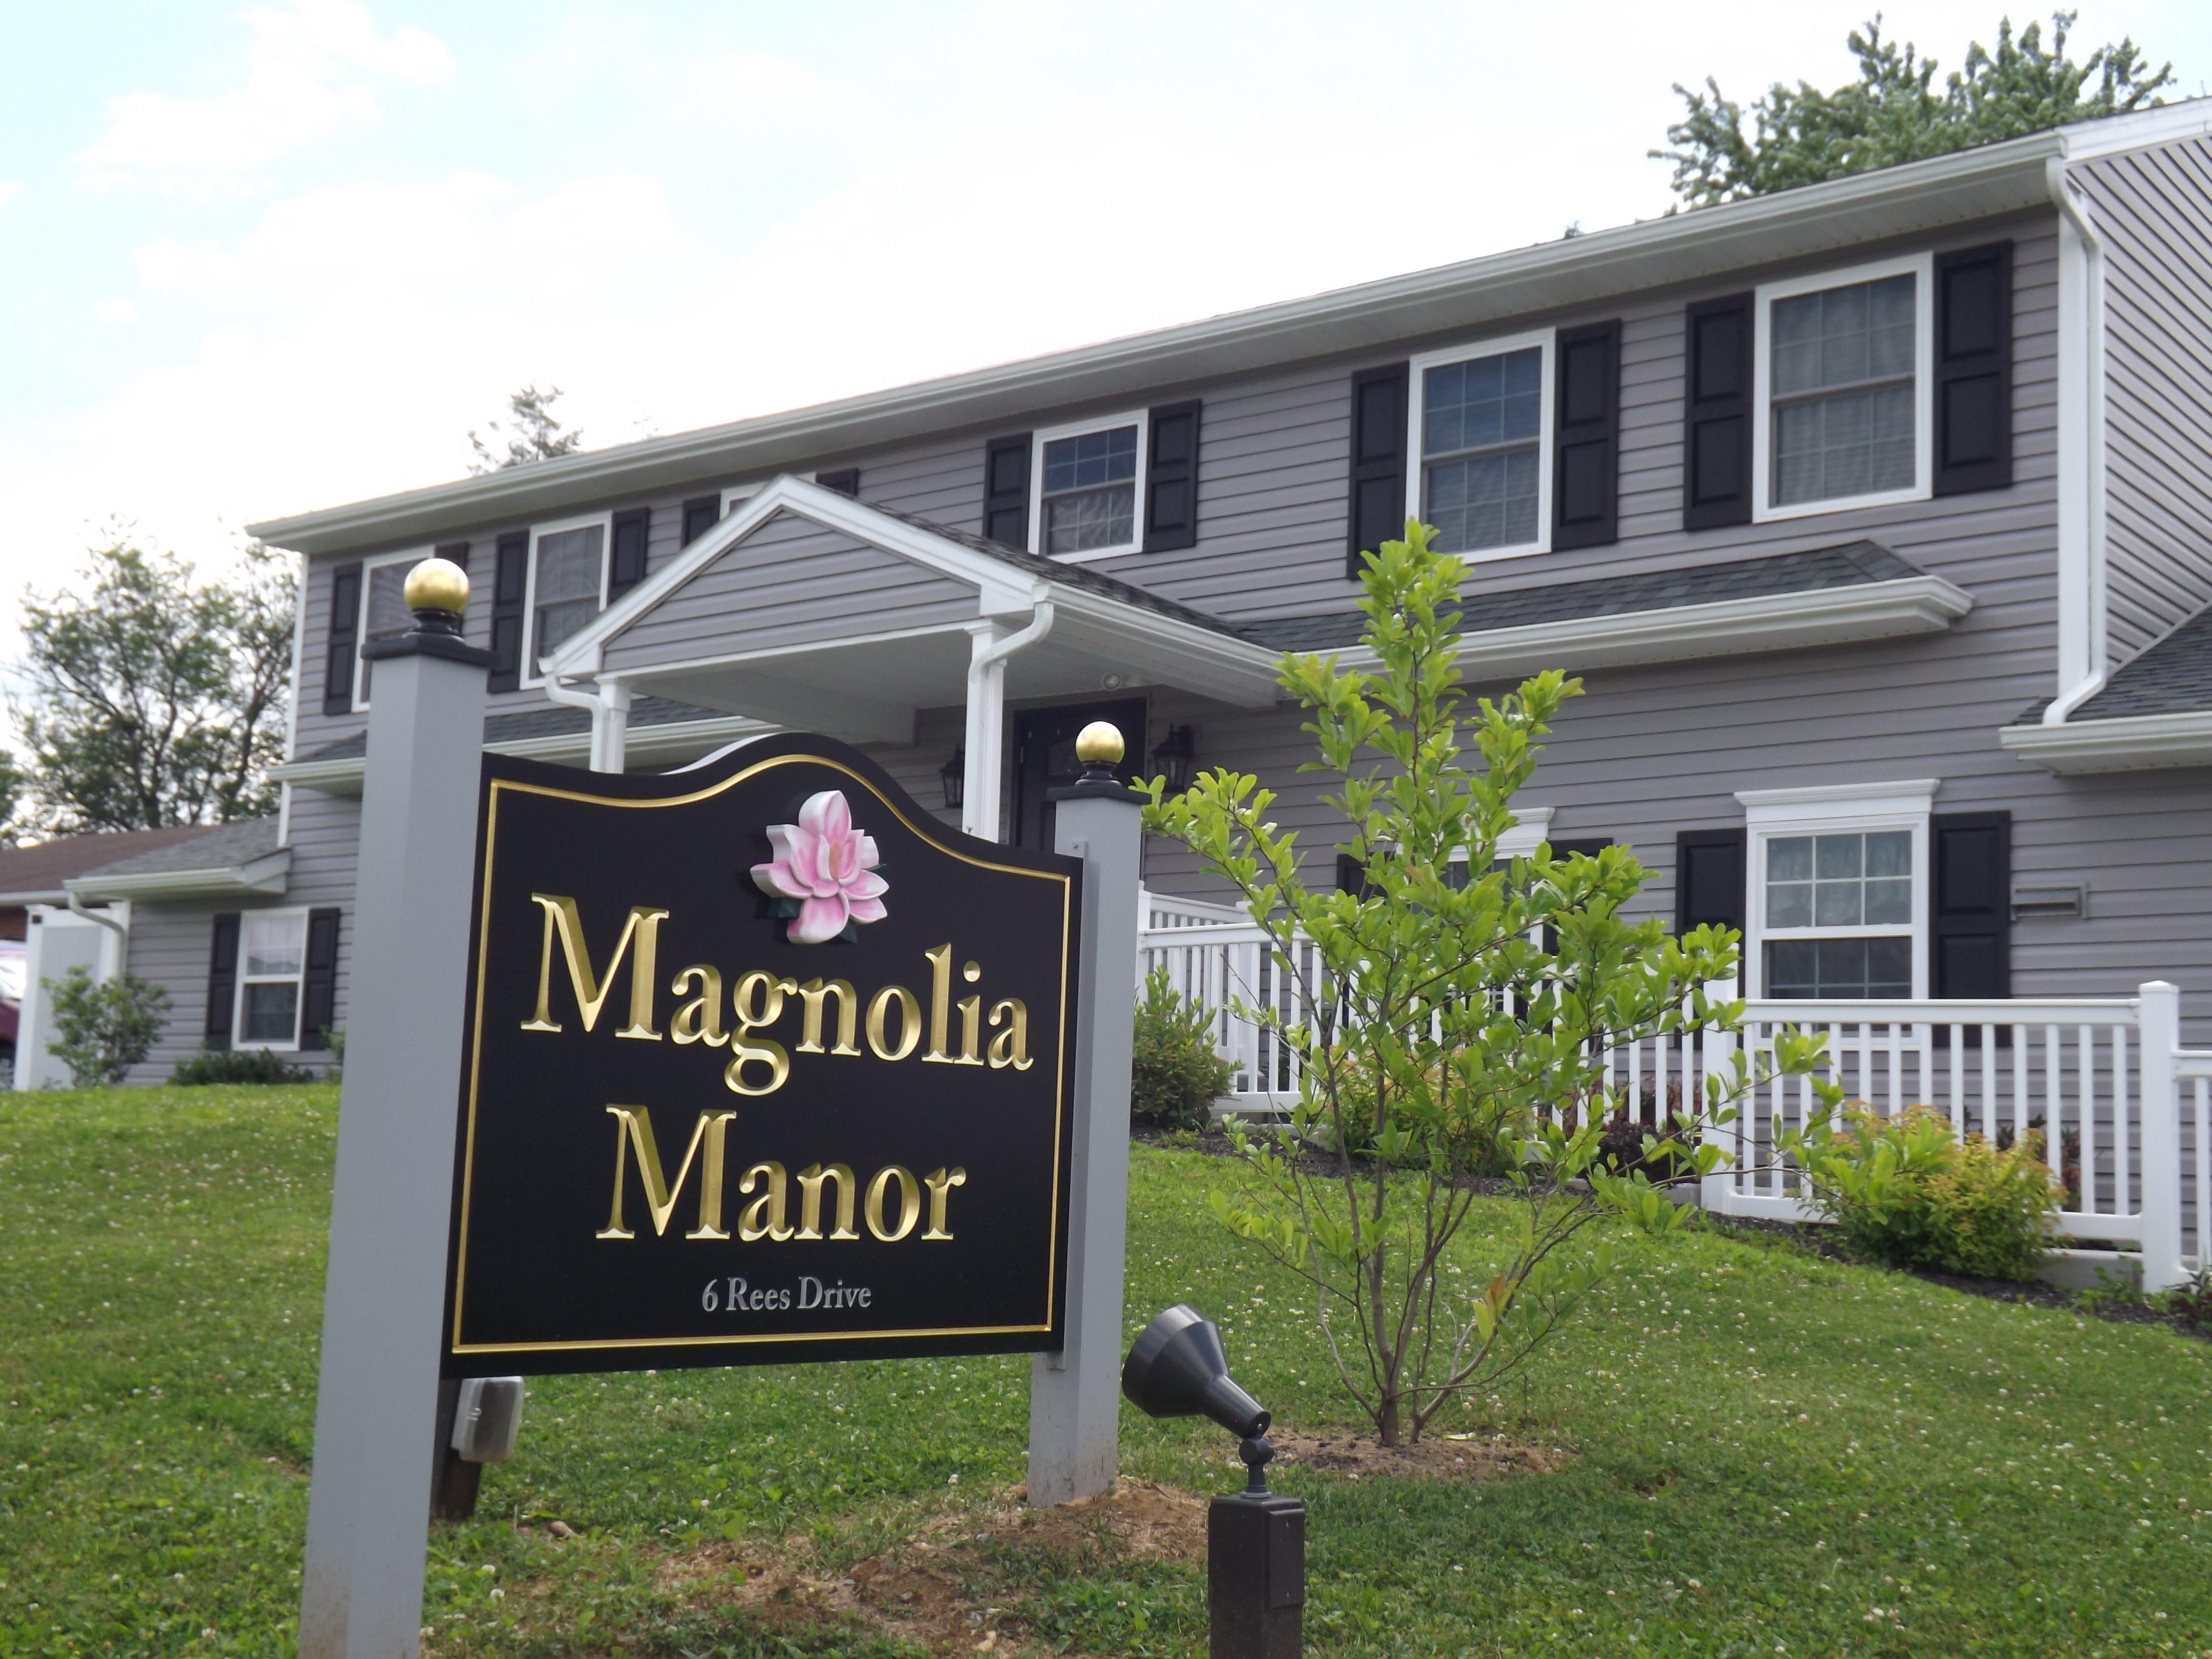 Photo 1 of Magnolia Manor